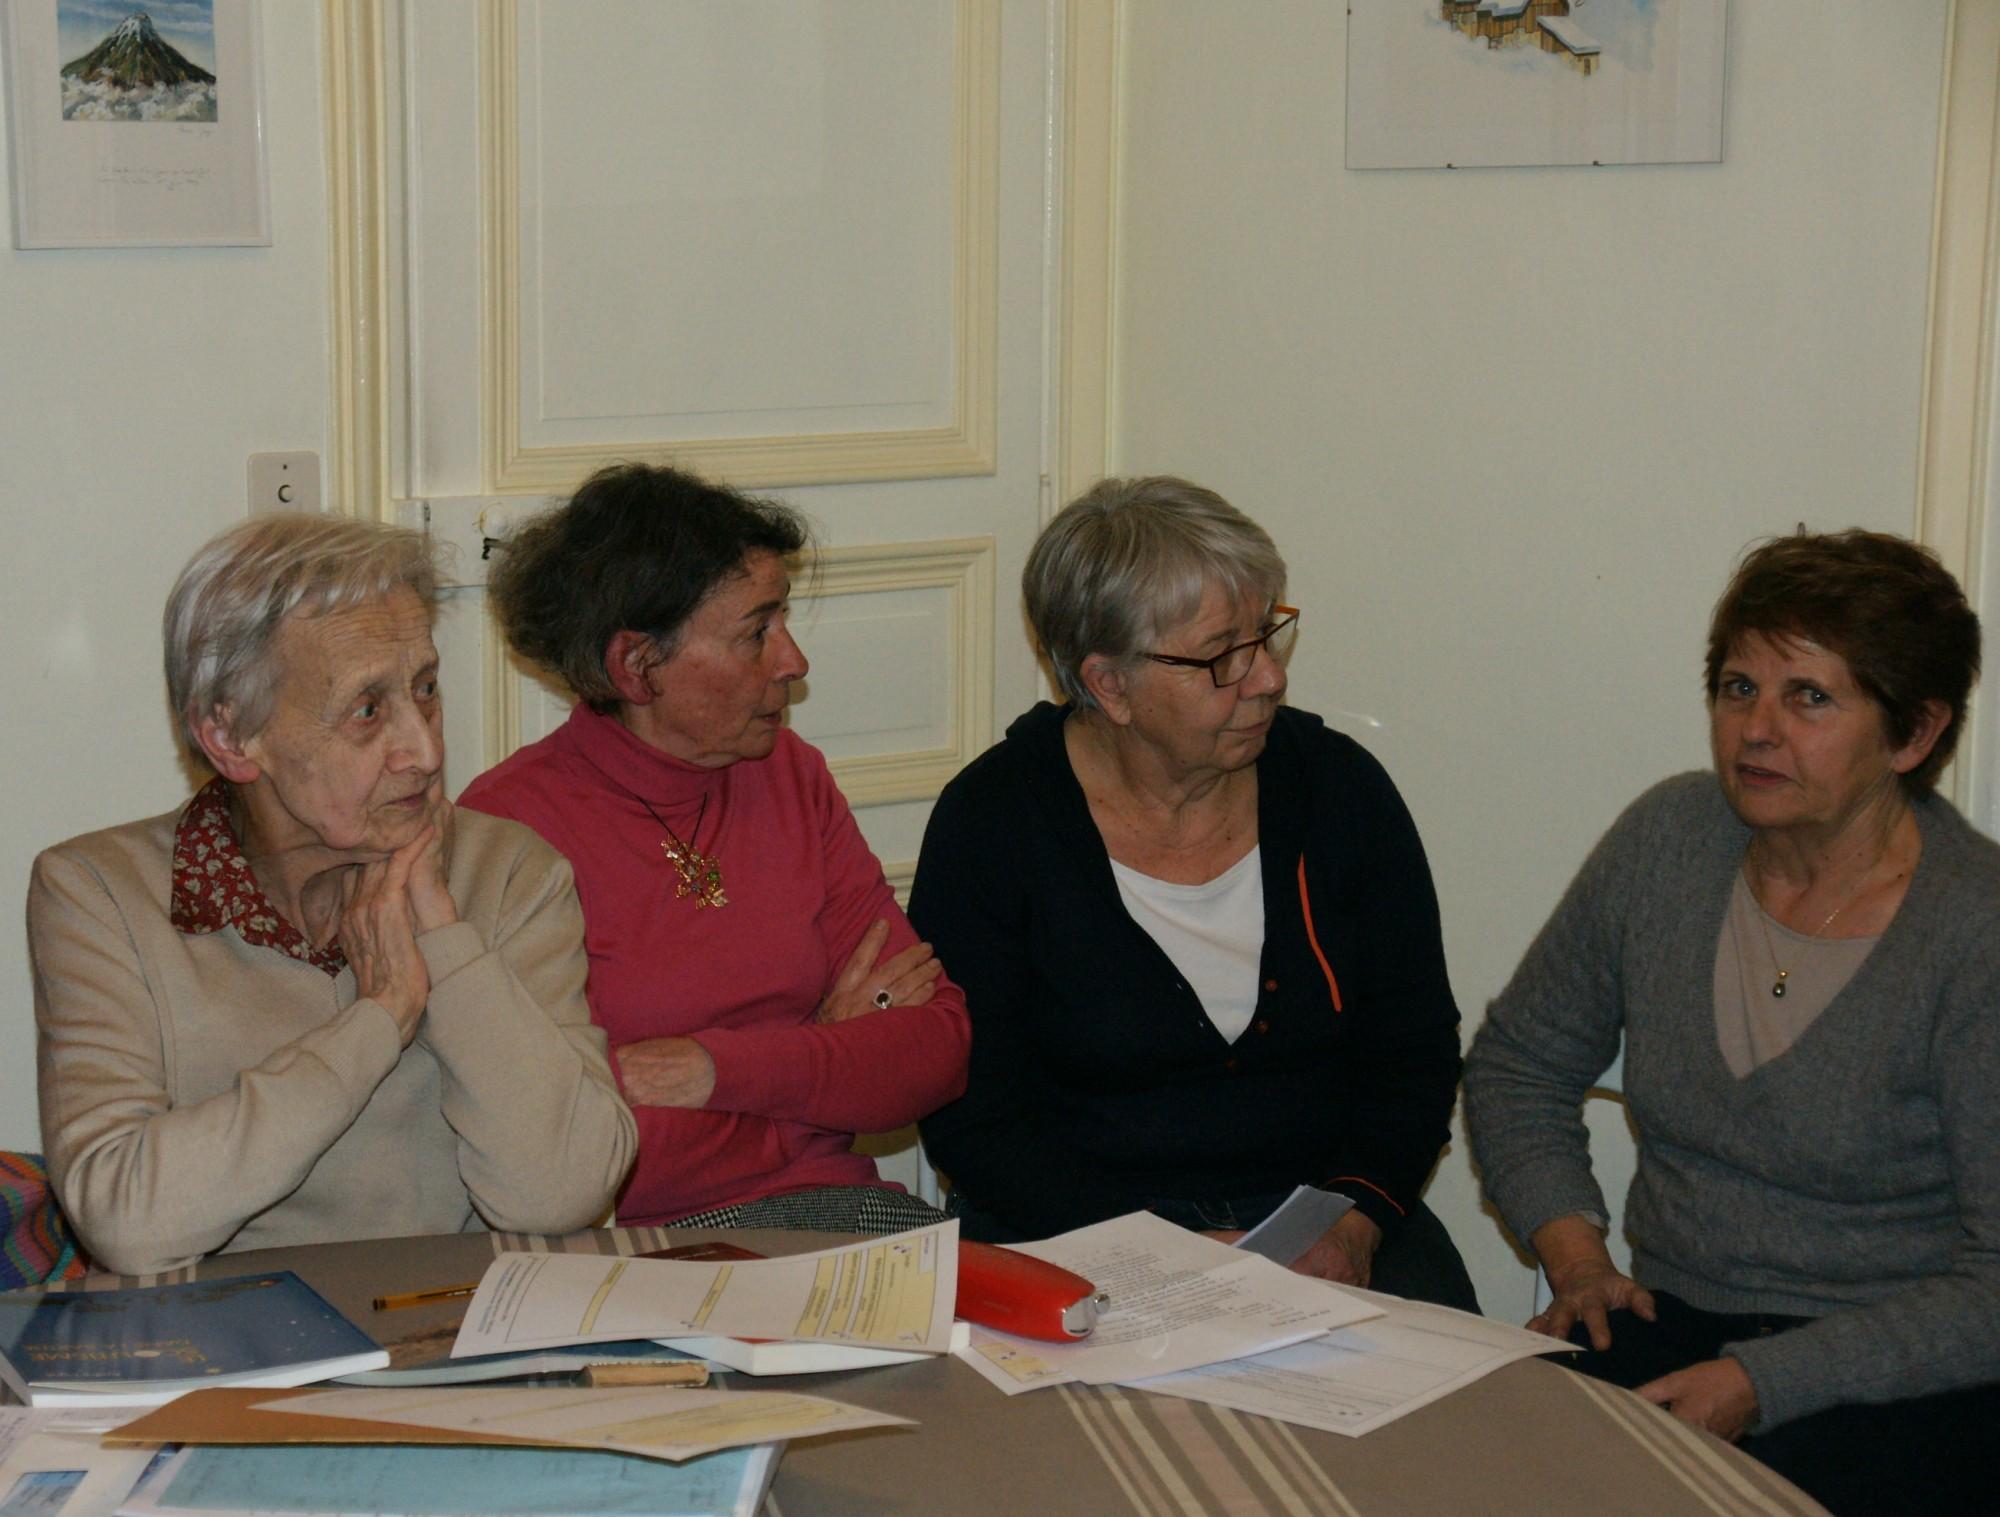 Roselyne, Marie-Christine, Françoise, Nicole